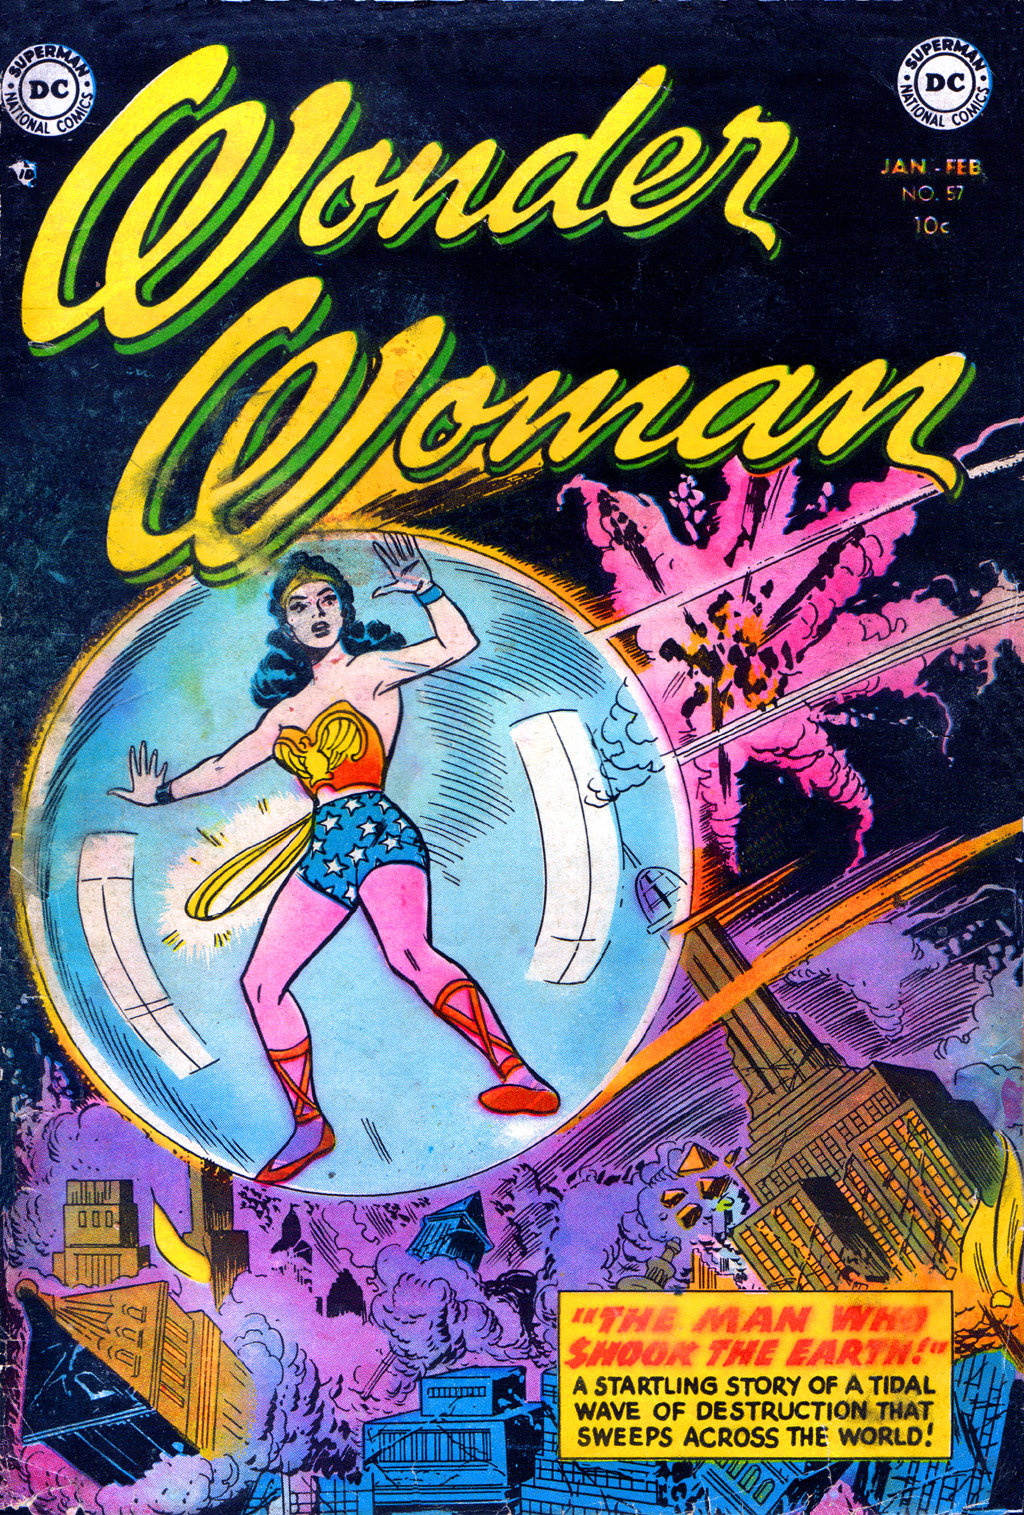 Read online Wonder Woman (1942) comic -  Issue #57 - 1